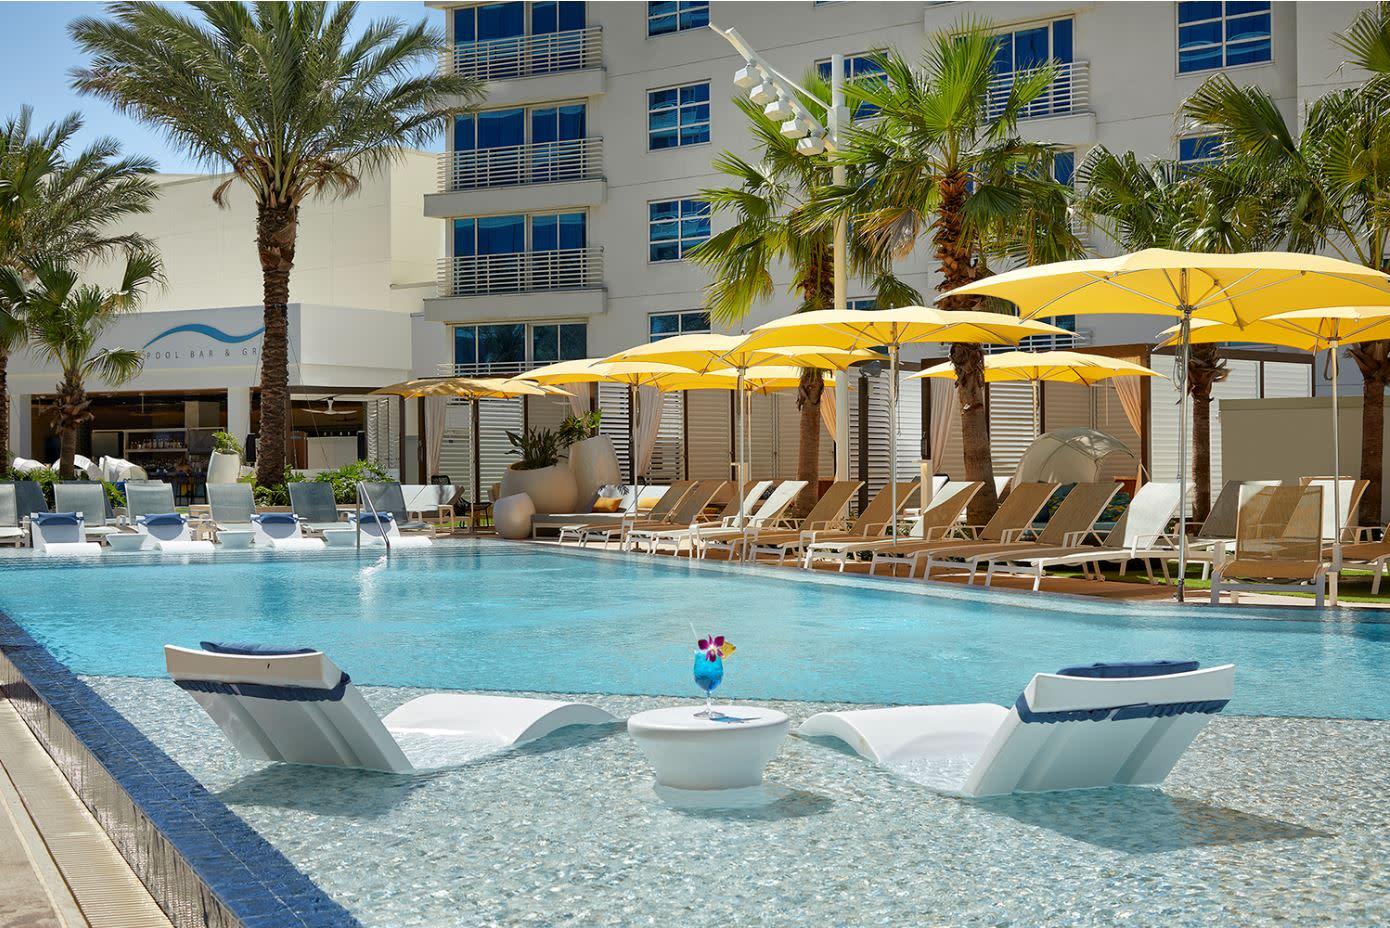 Seminole hard rock hotel casino tampa address